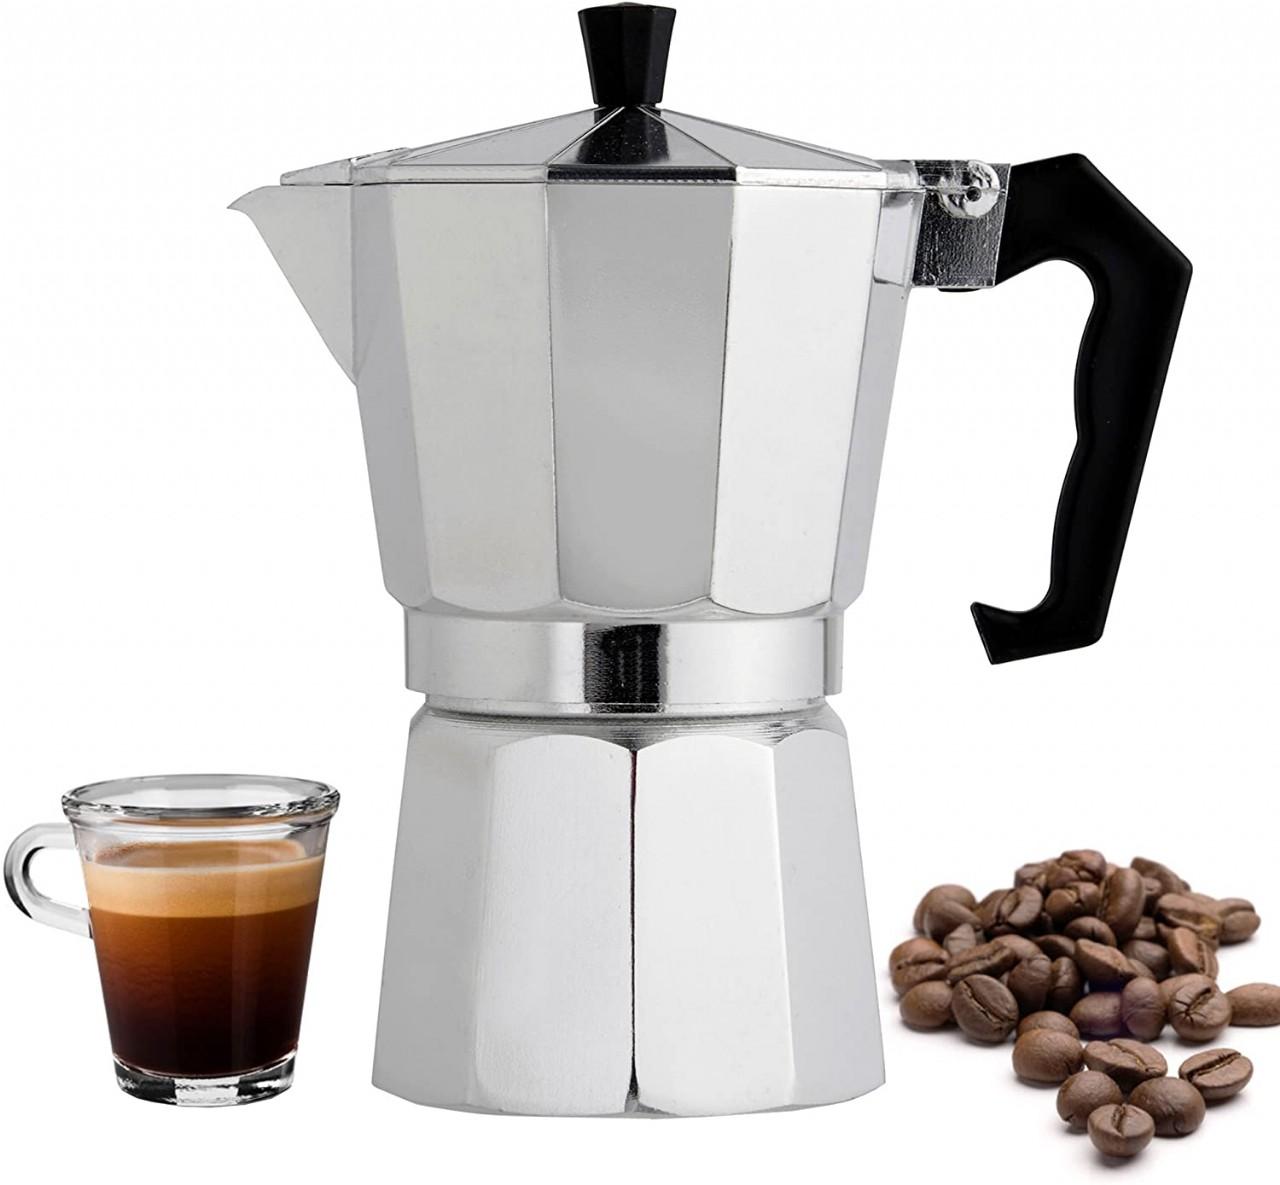 Stovetop Espresso Maker Moka Pots Machine Shot Coffee 6 Cup